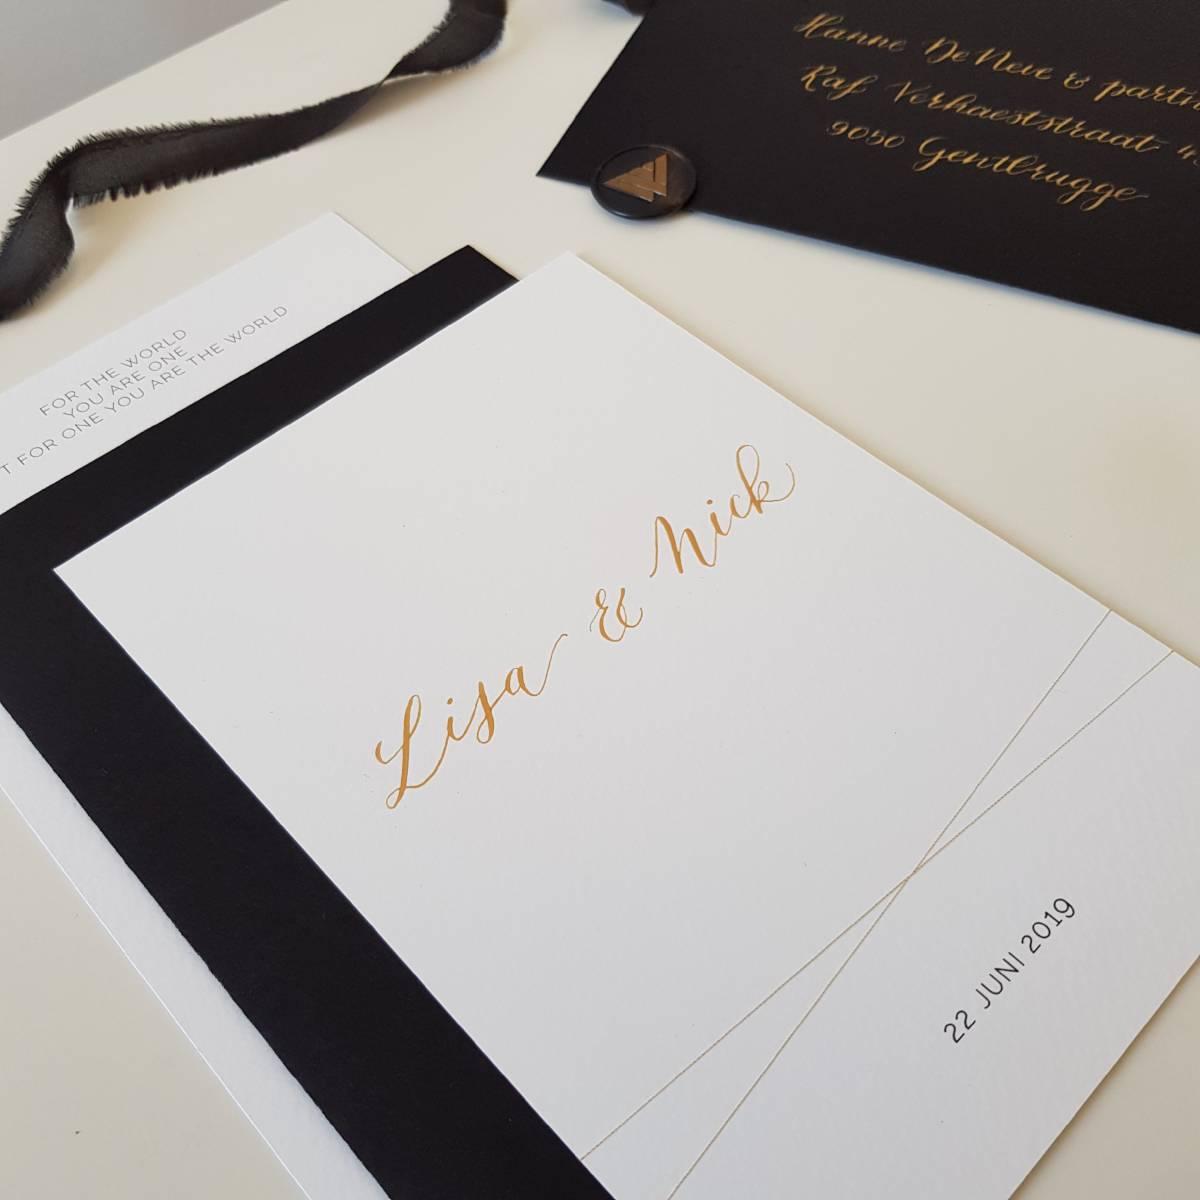 Touch of Gold - Trouwuitnodiging - Huwelijksuitnodiging - Kalligrafie - House of Weddings - 9